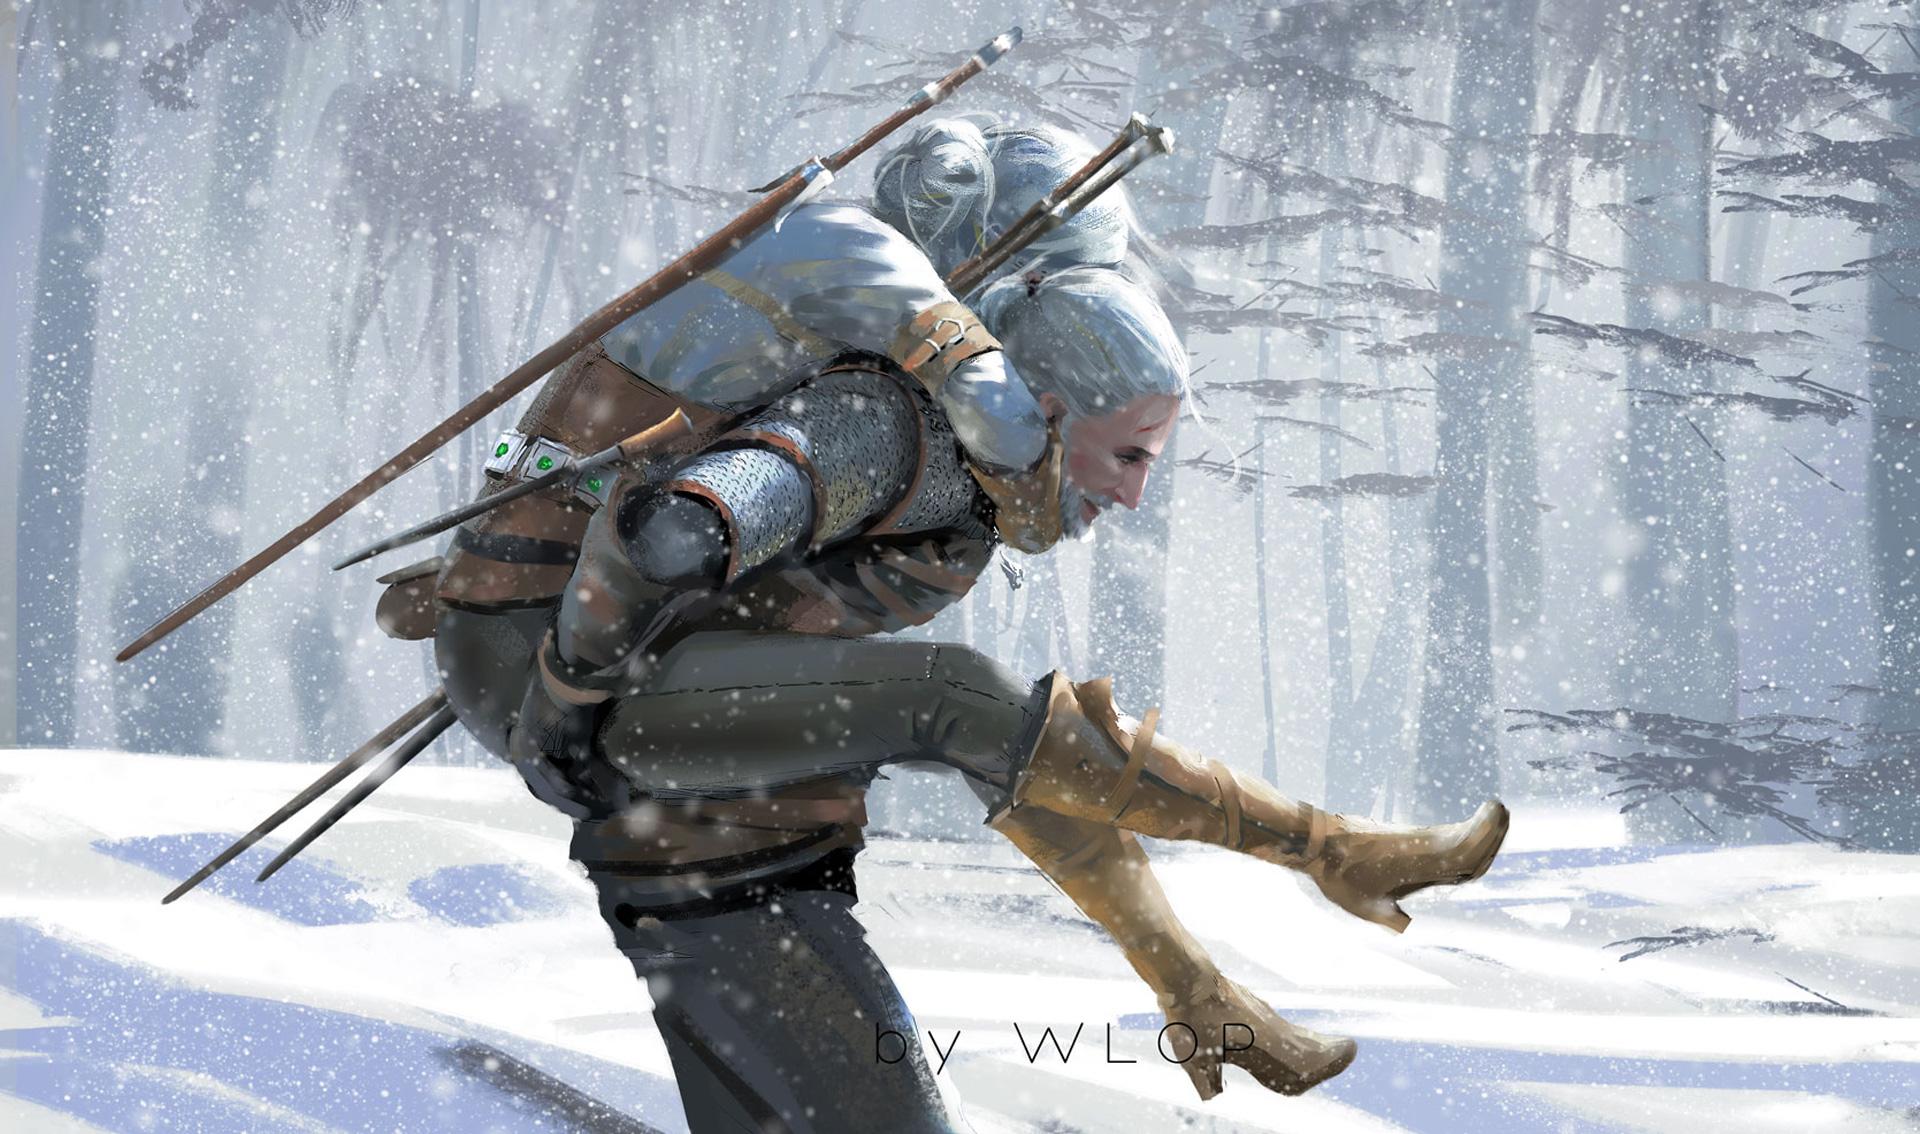 The witcher 3 wild hunt artwork by wlop hd artist 4k - The witcher wallpaper 4k ...